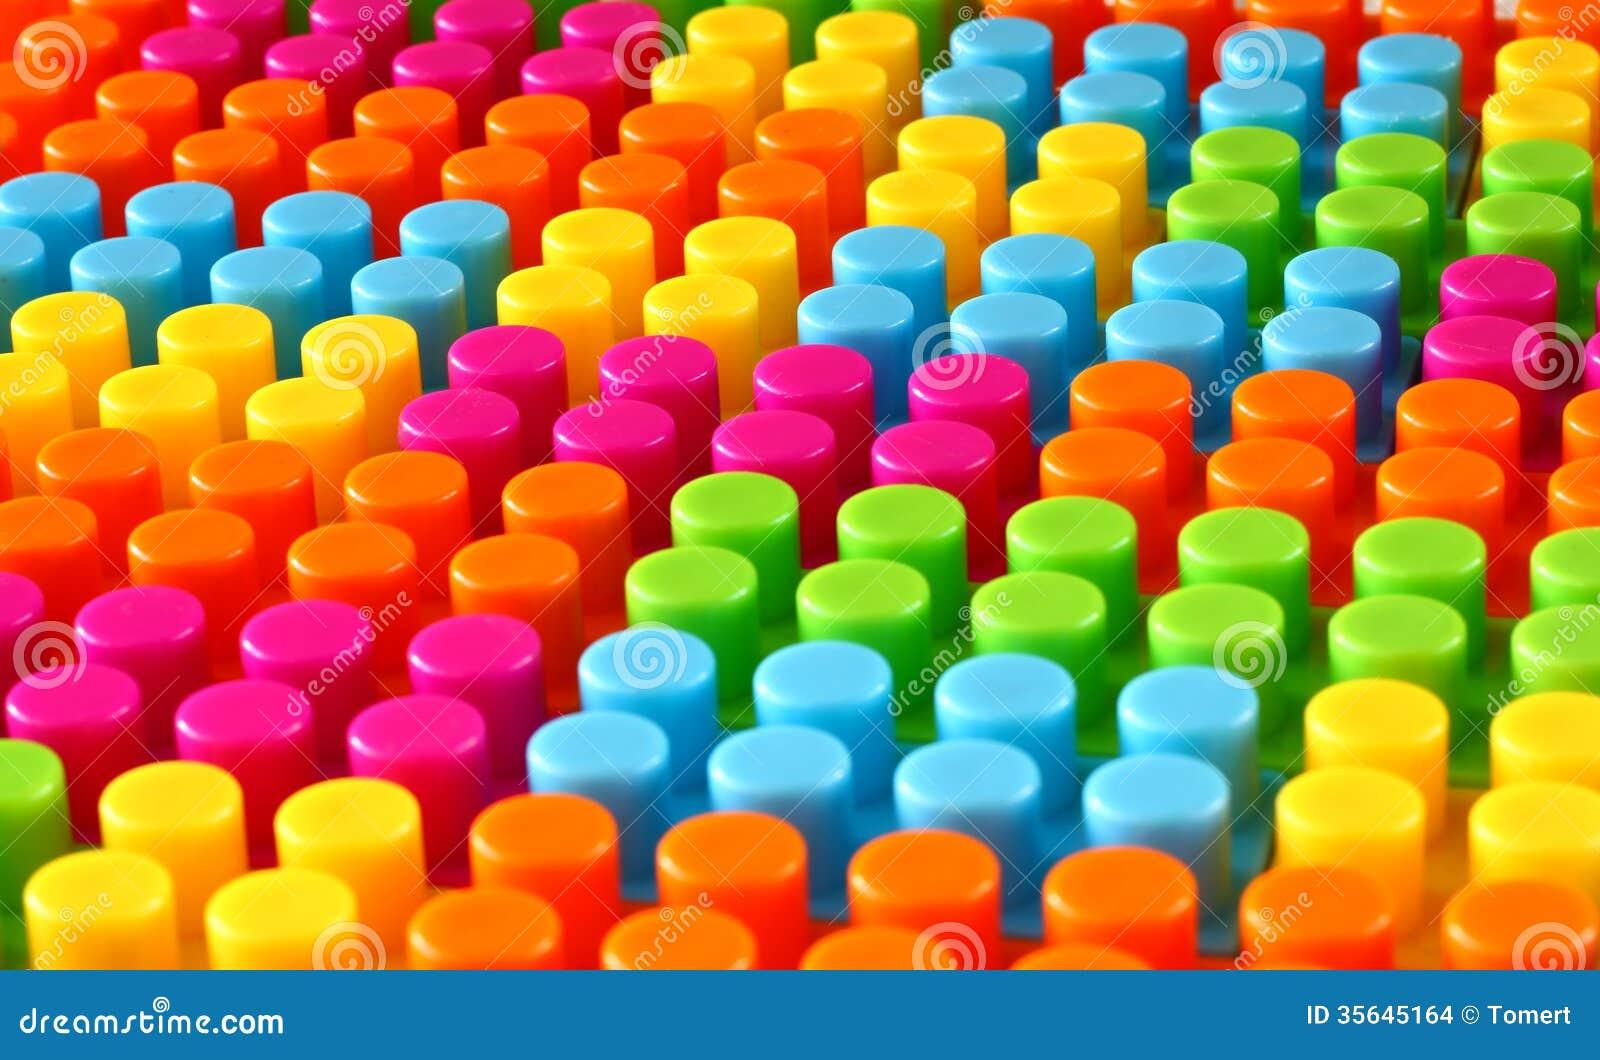 Colorful Children Lego Brick Toy Background Stock Photo ...